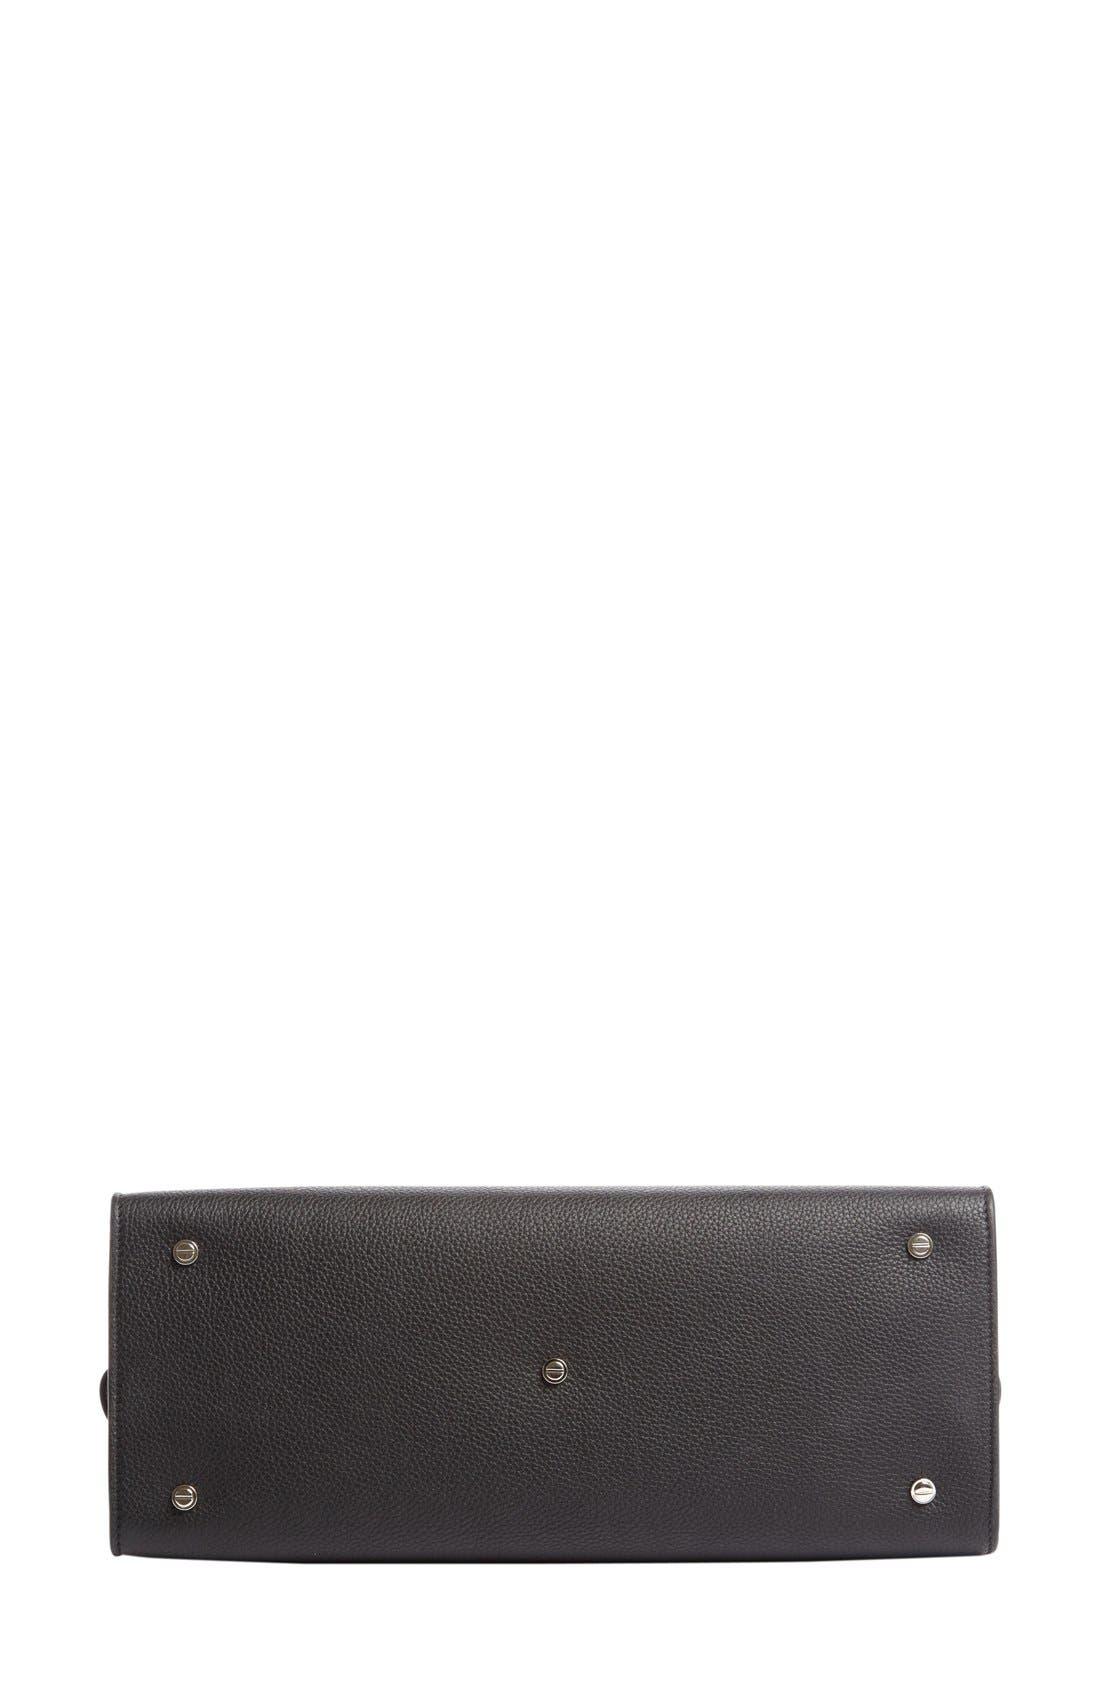 Medium Horizon Grained Calfskin Leather Tote,                             Alternate thumbnail 9, color,                             BLACK